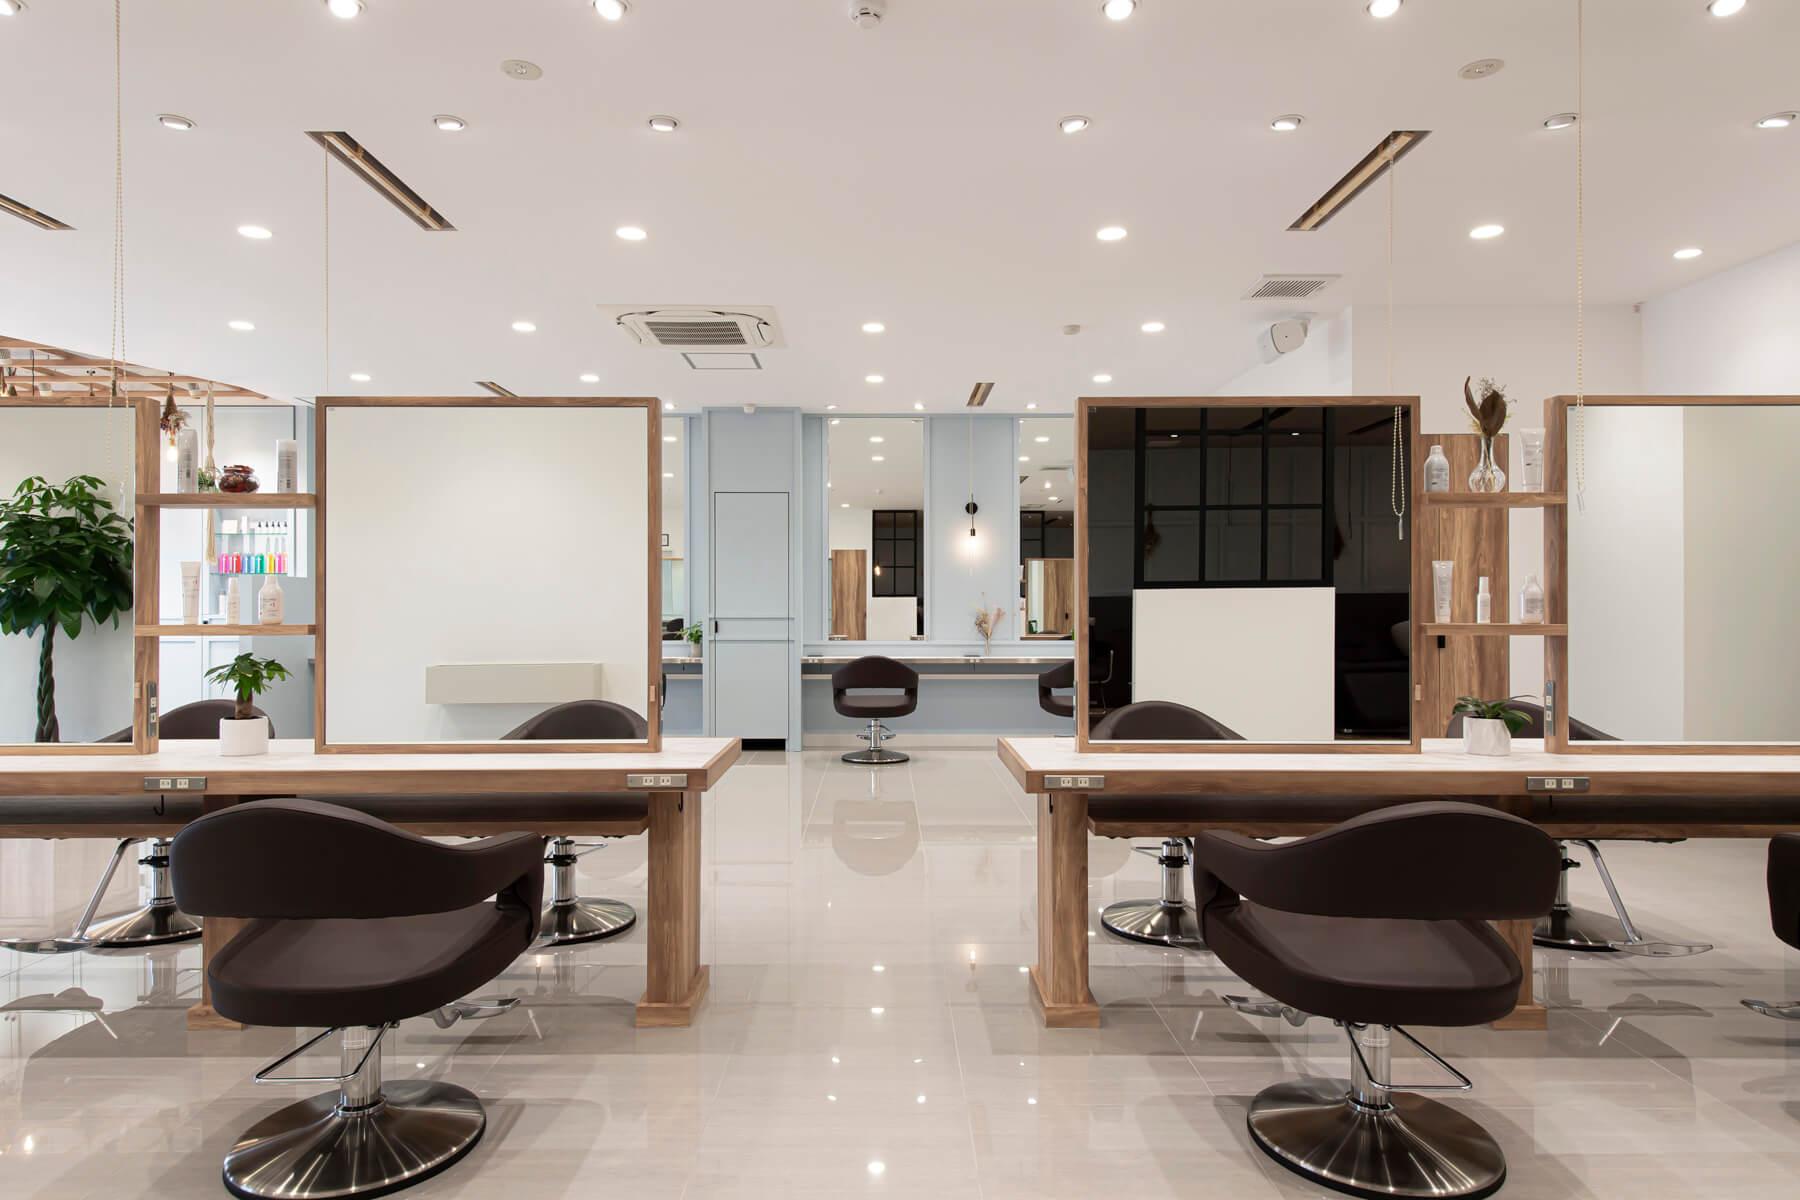 EARTH coiffure beaute 佐倉店/Chiba